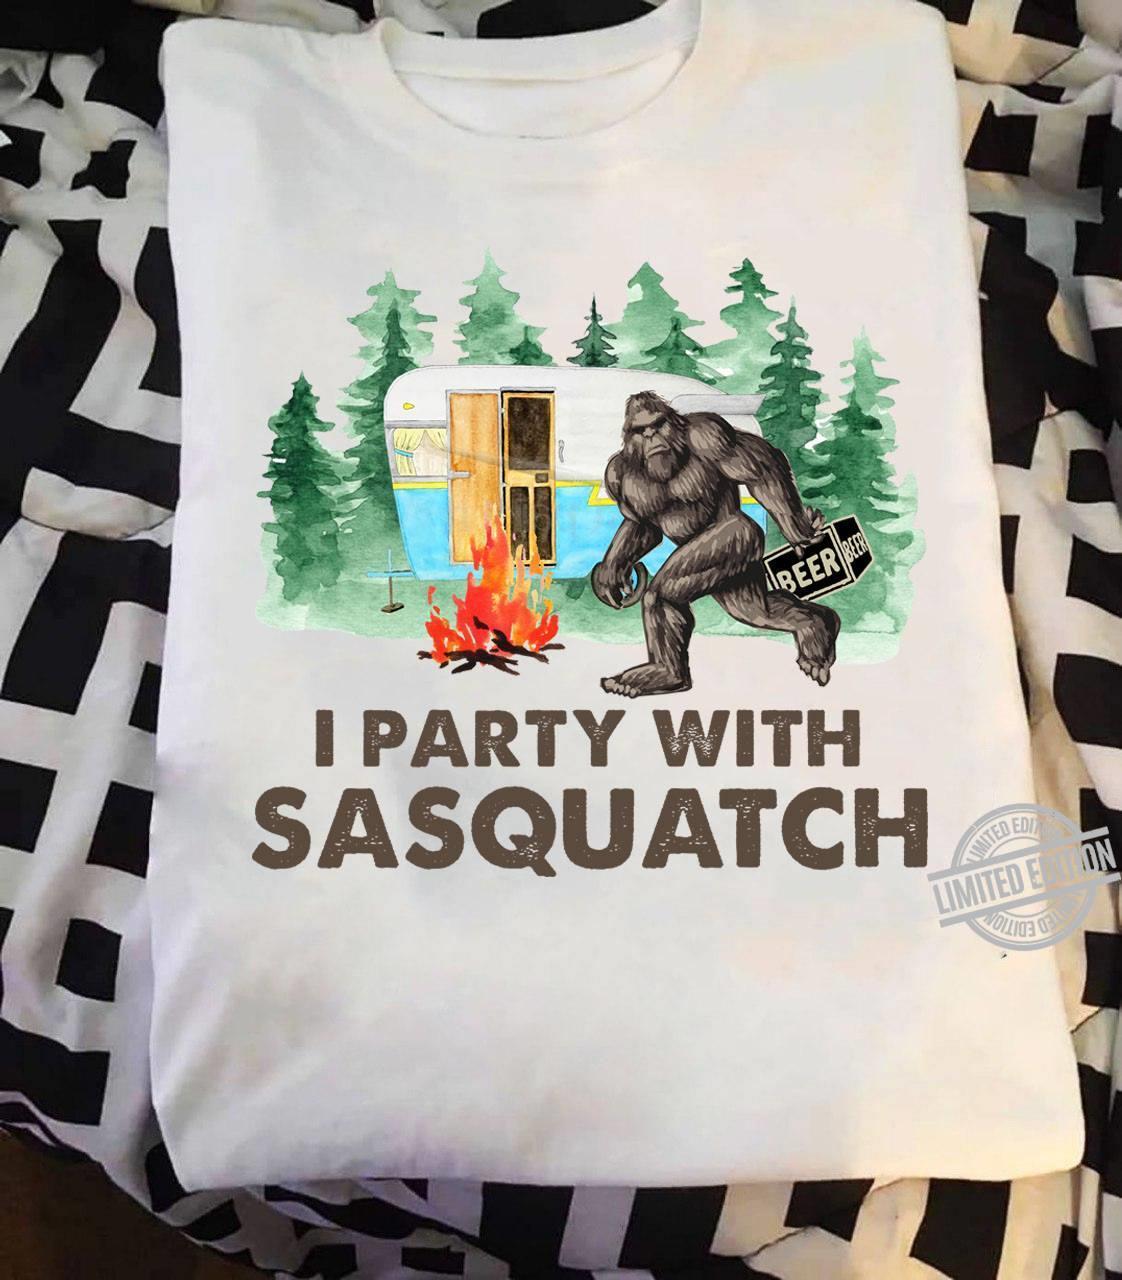 I Party With Sasquatch Shirt